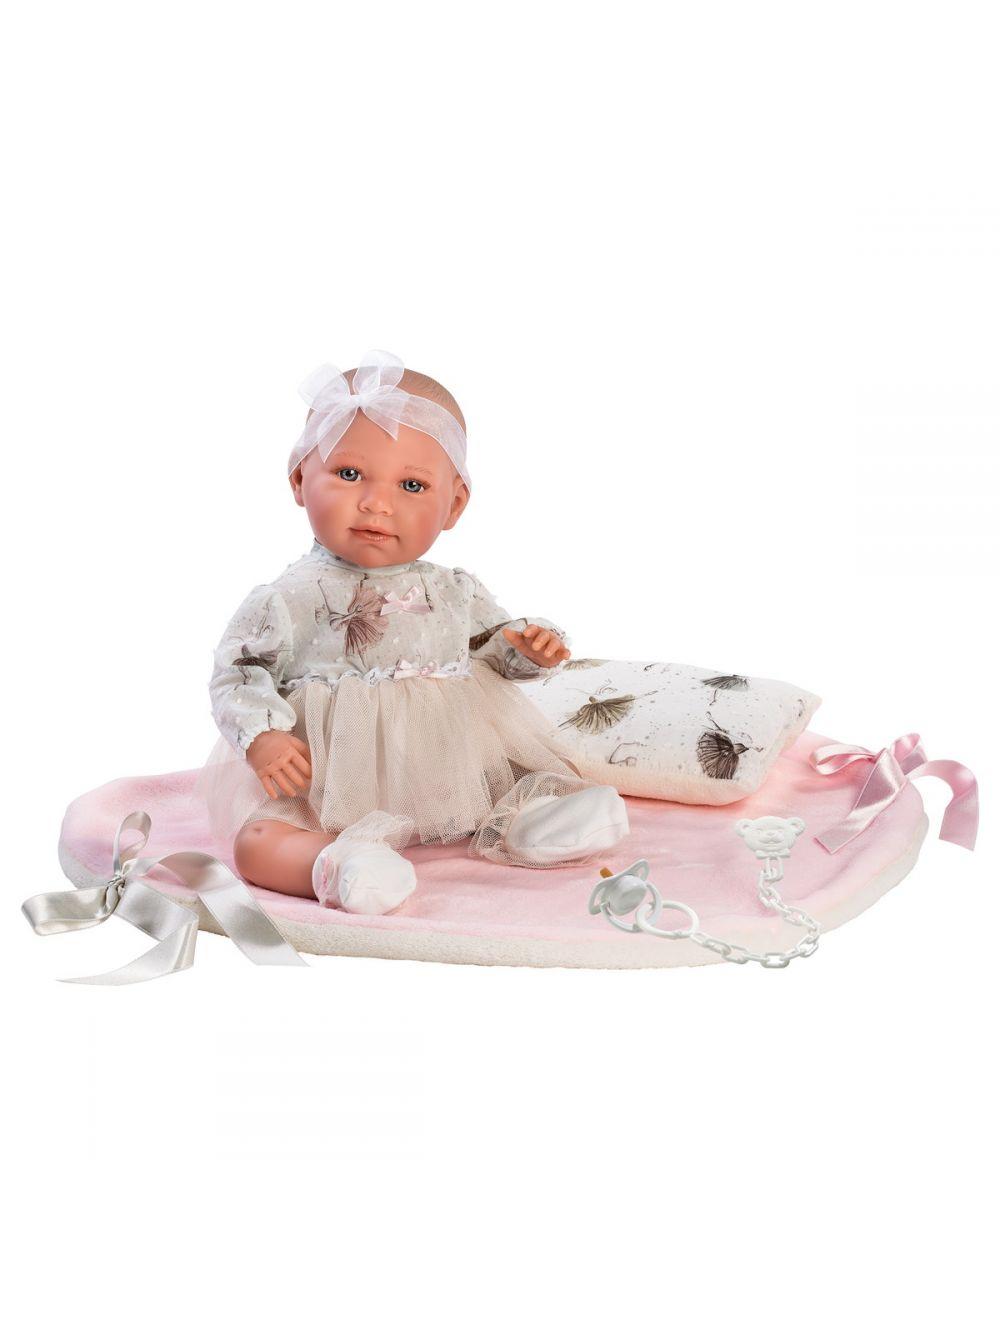 Llorens 74062 Lalka płacząca Mimi bobas różowy kocyk